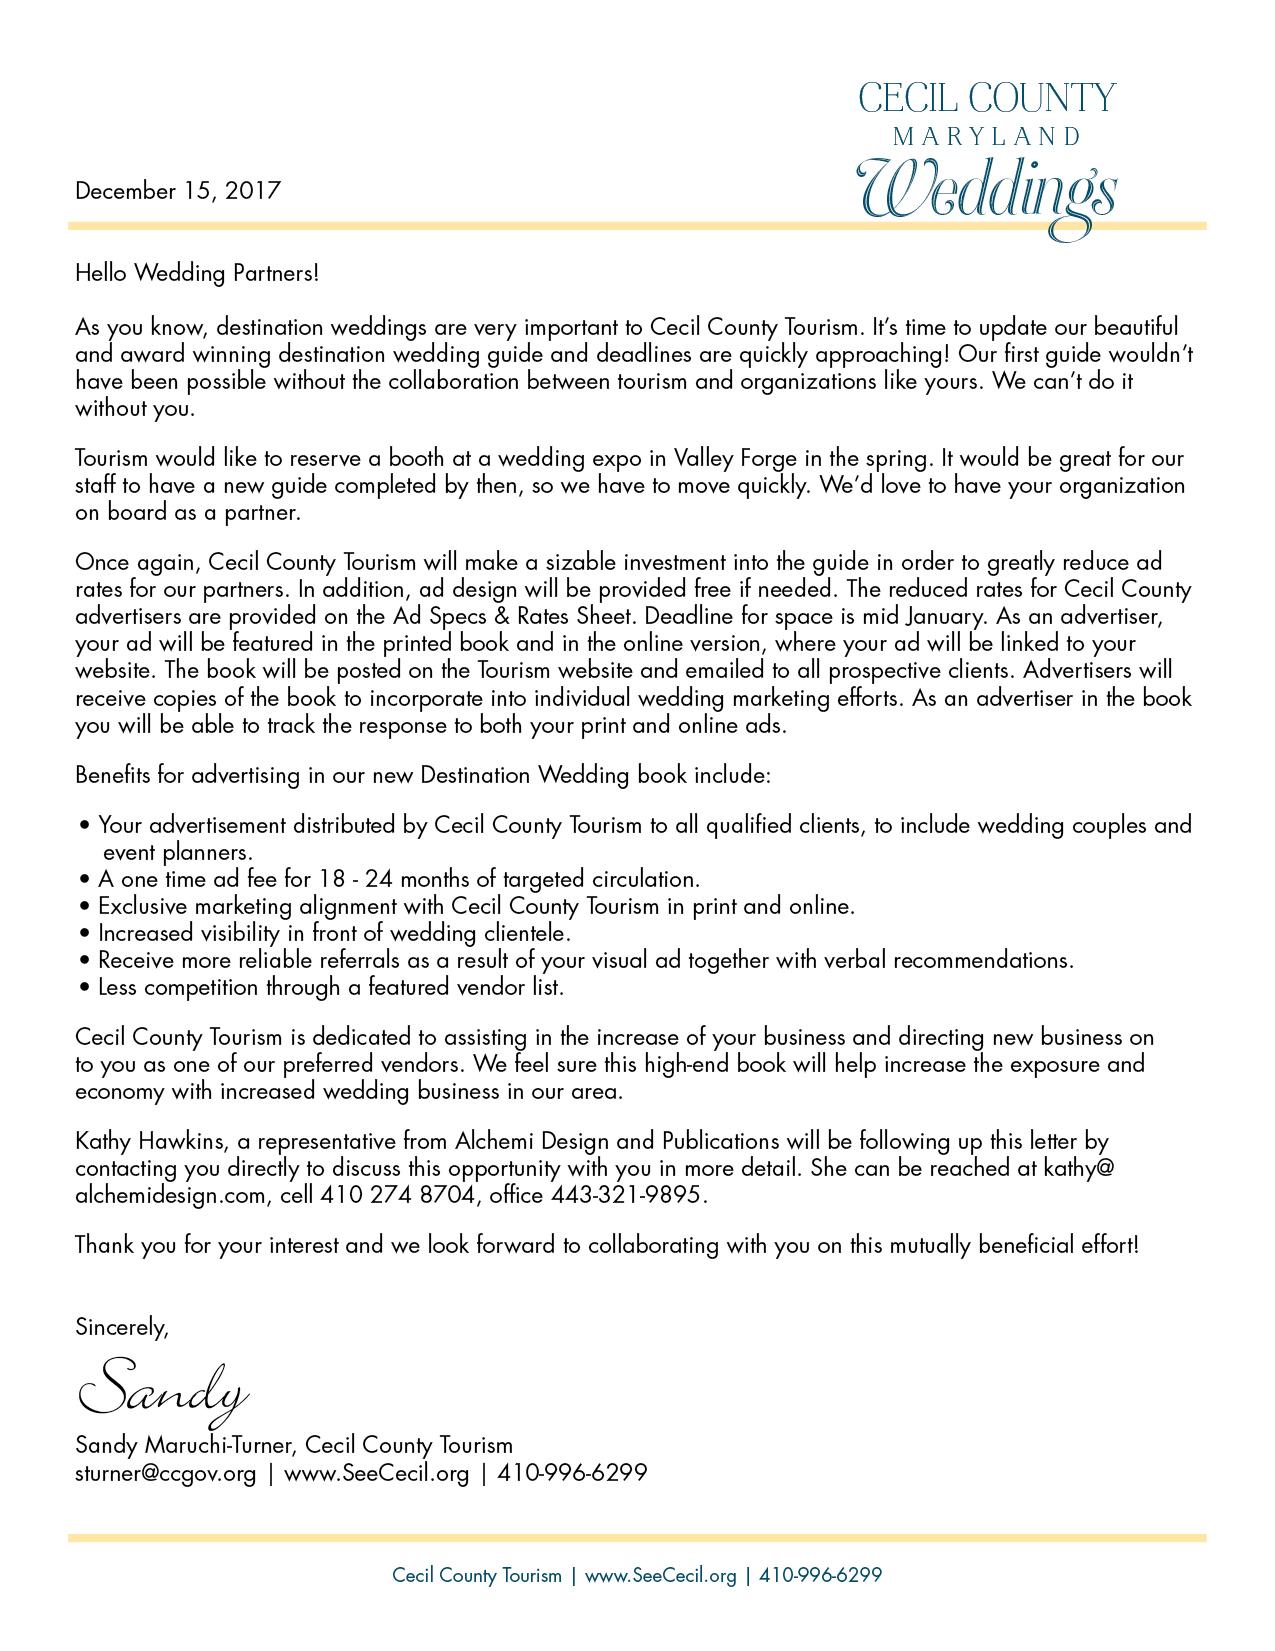 Letter from Sandy Maruchi-Turner